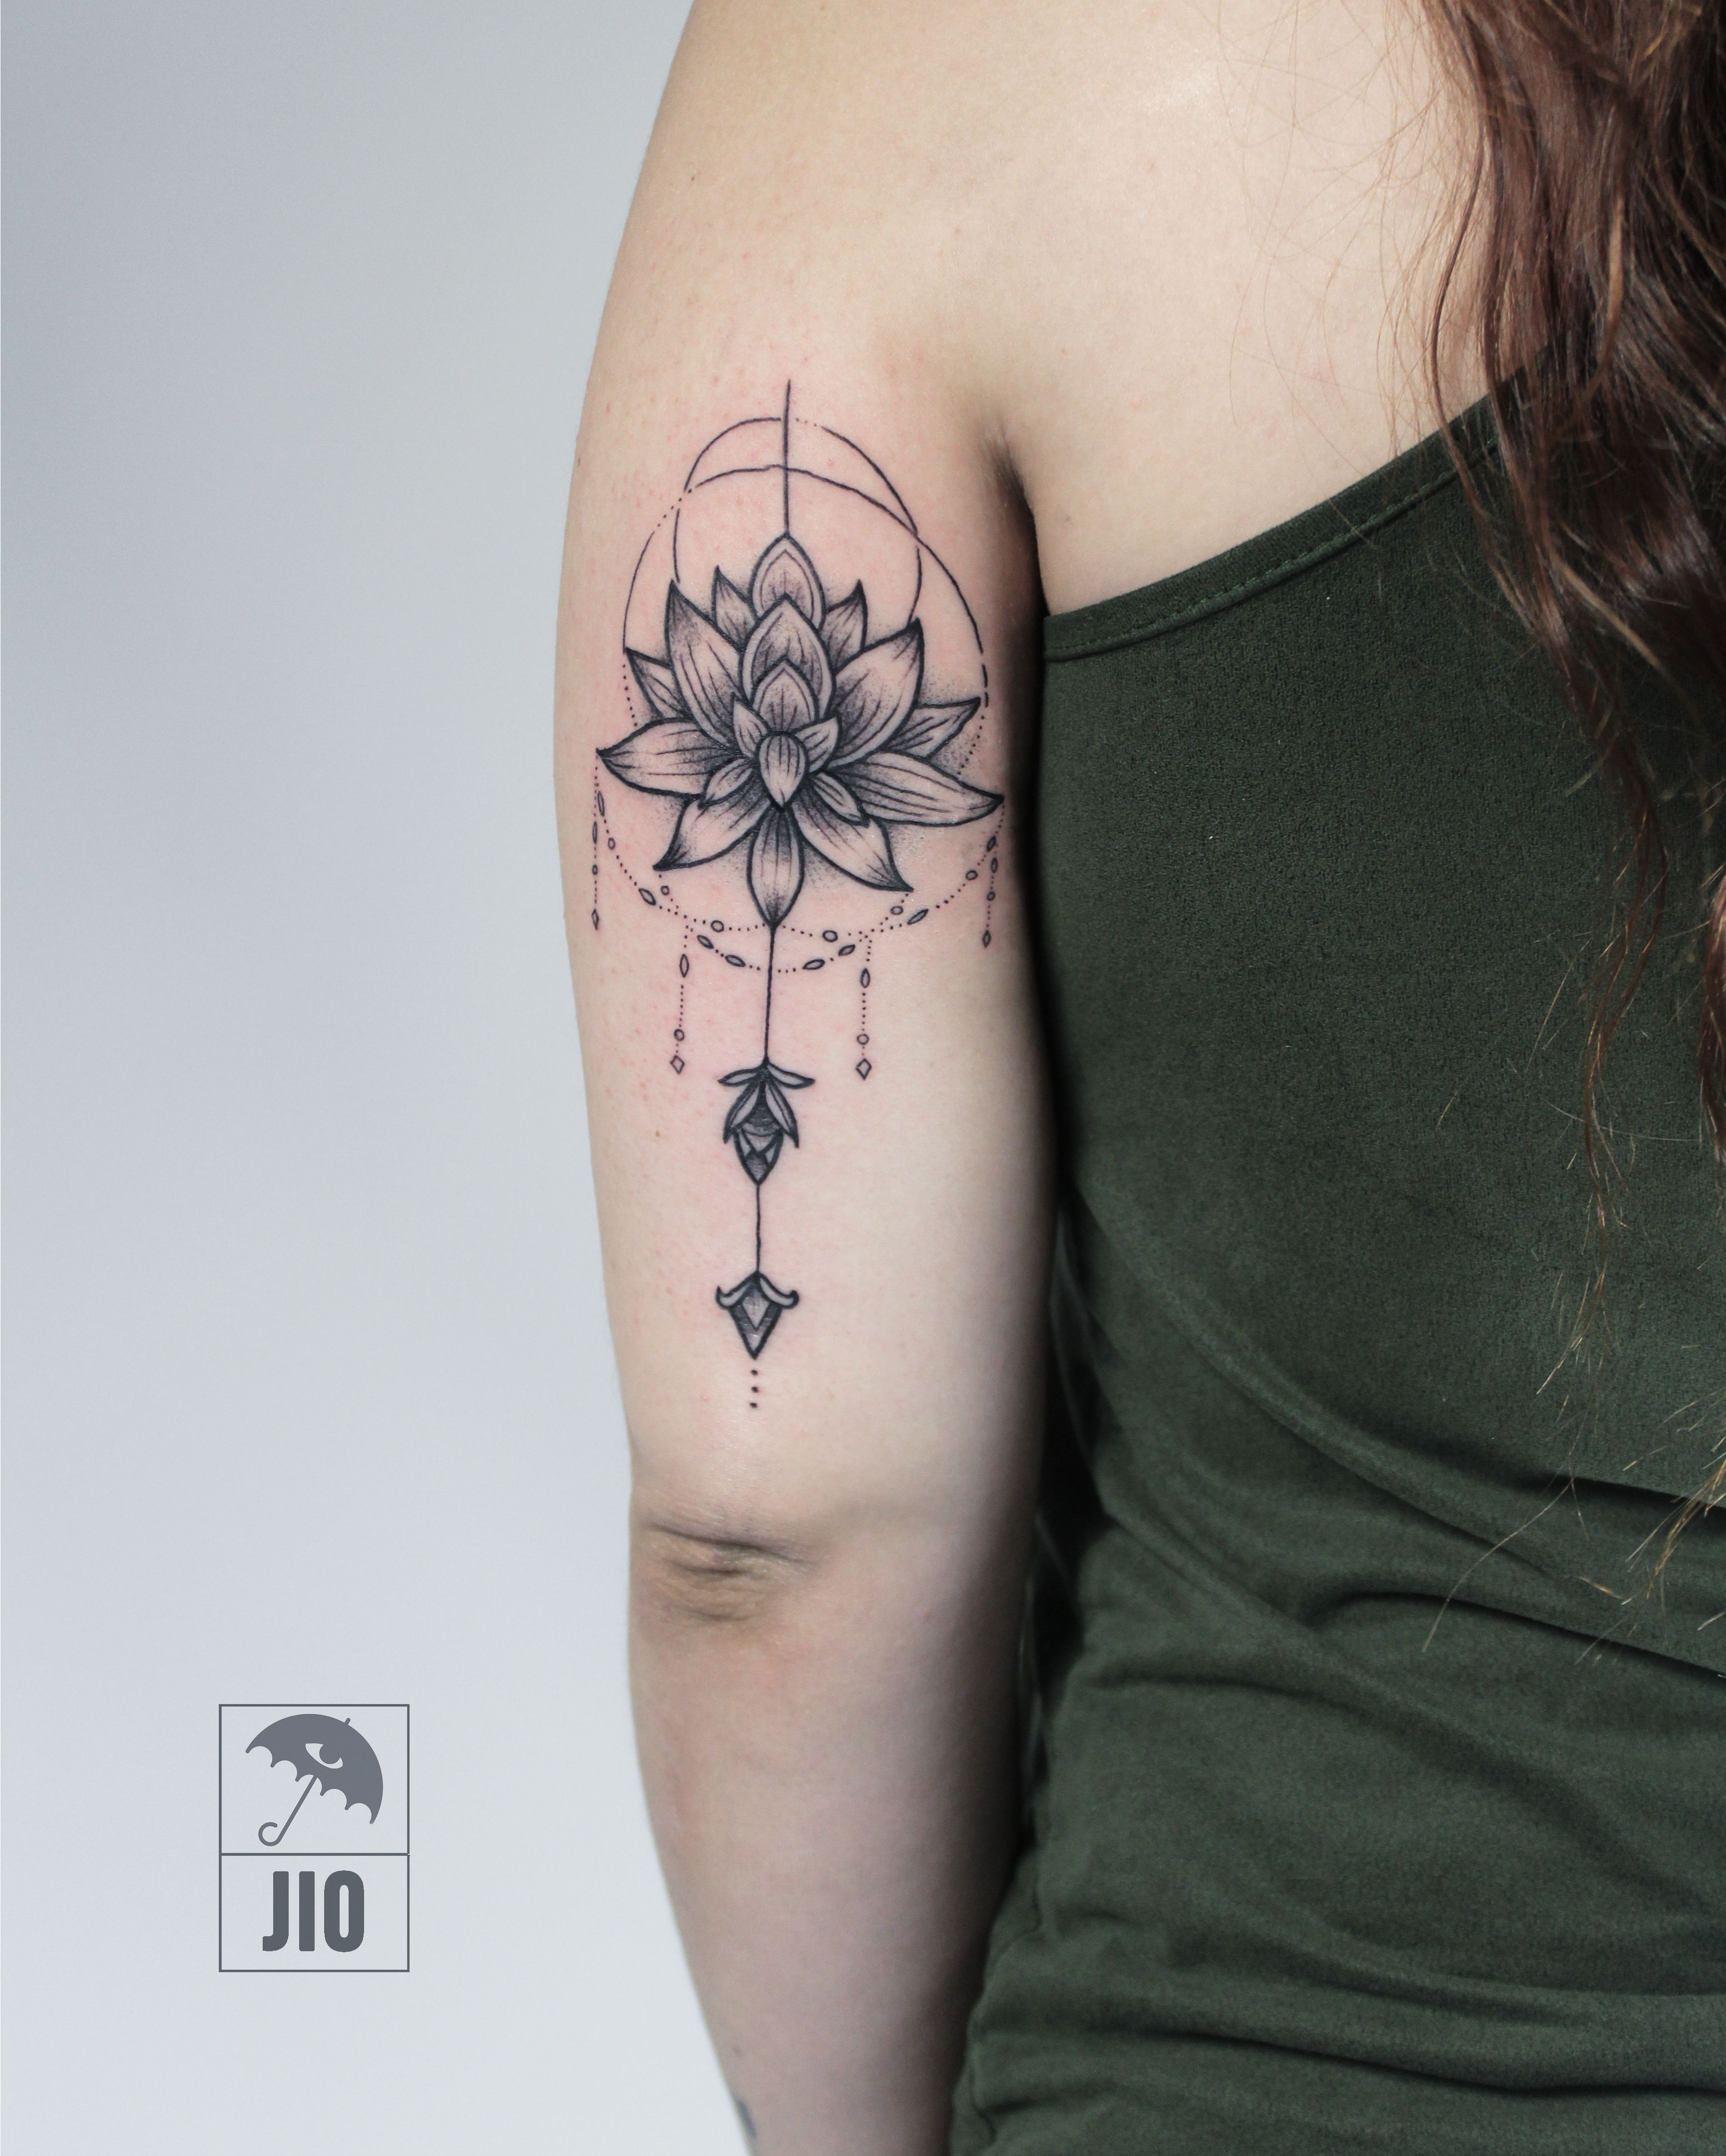 Black, Black Tattoo, Blackwork, Blackwork Tattoo, Black